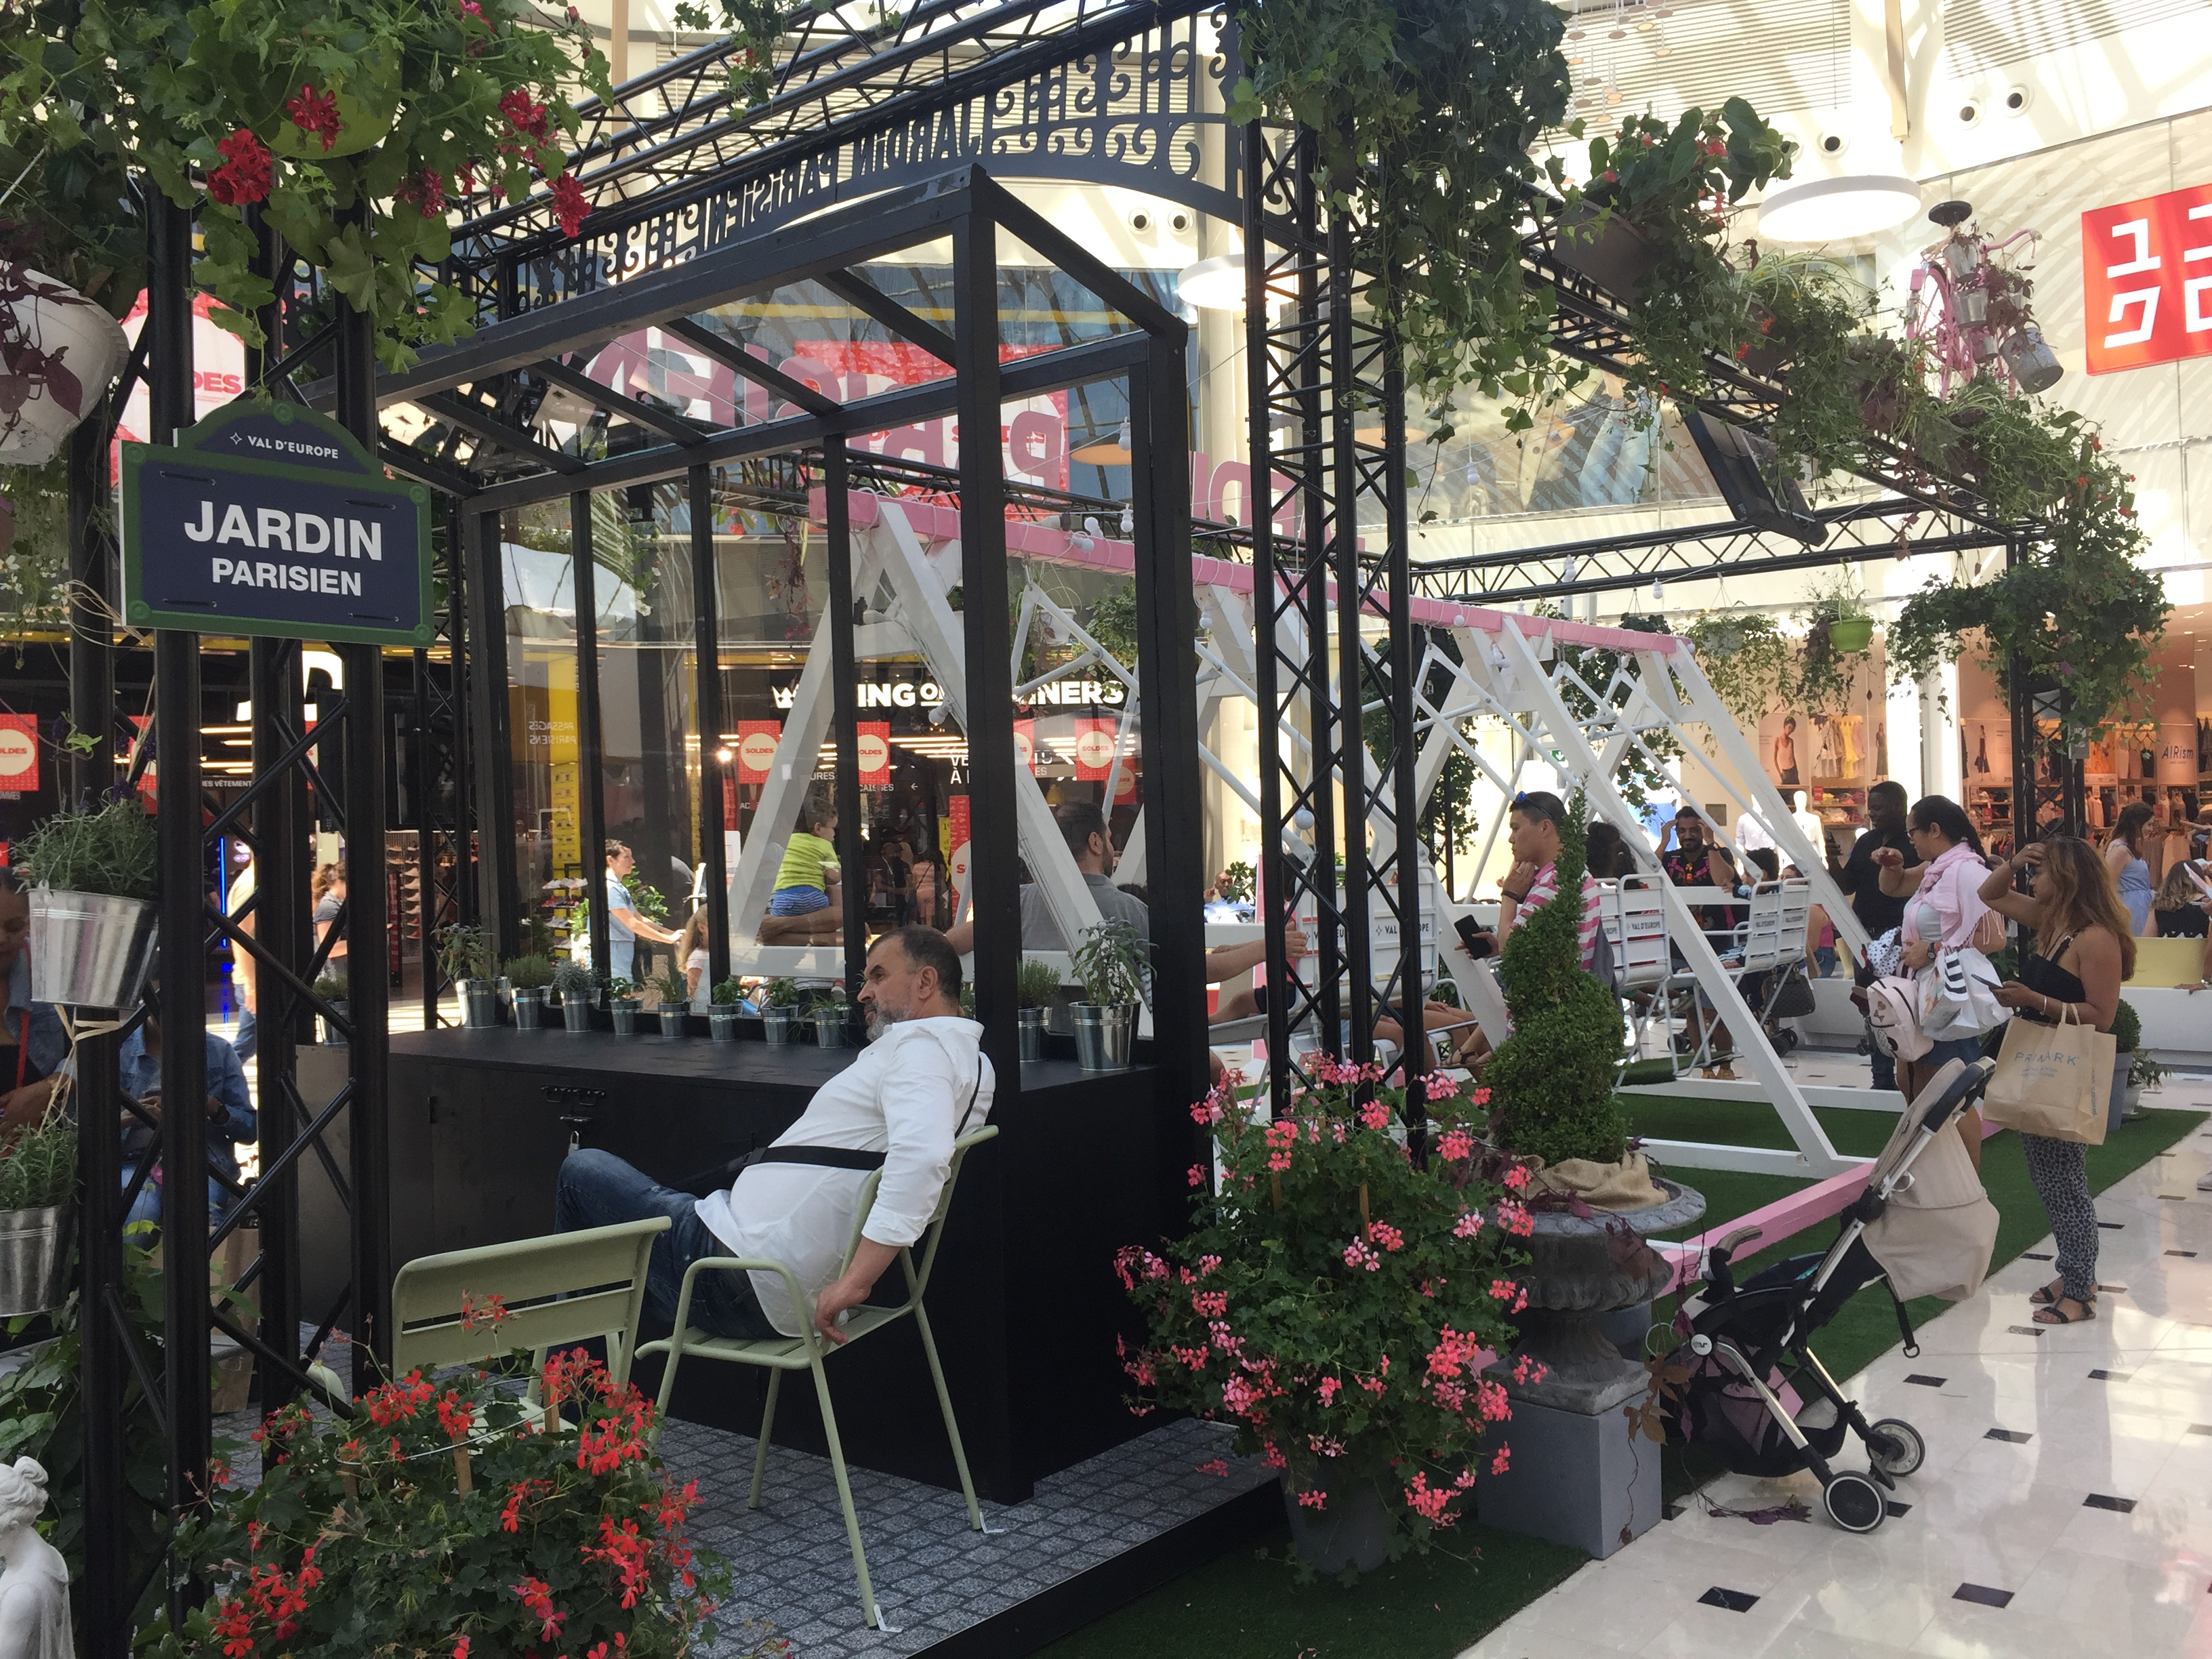 visuel VAL D'EUROPE – Les Jardins Parisiens